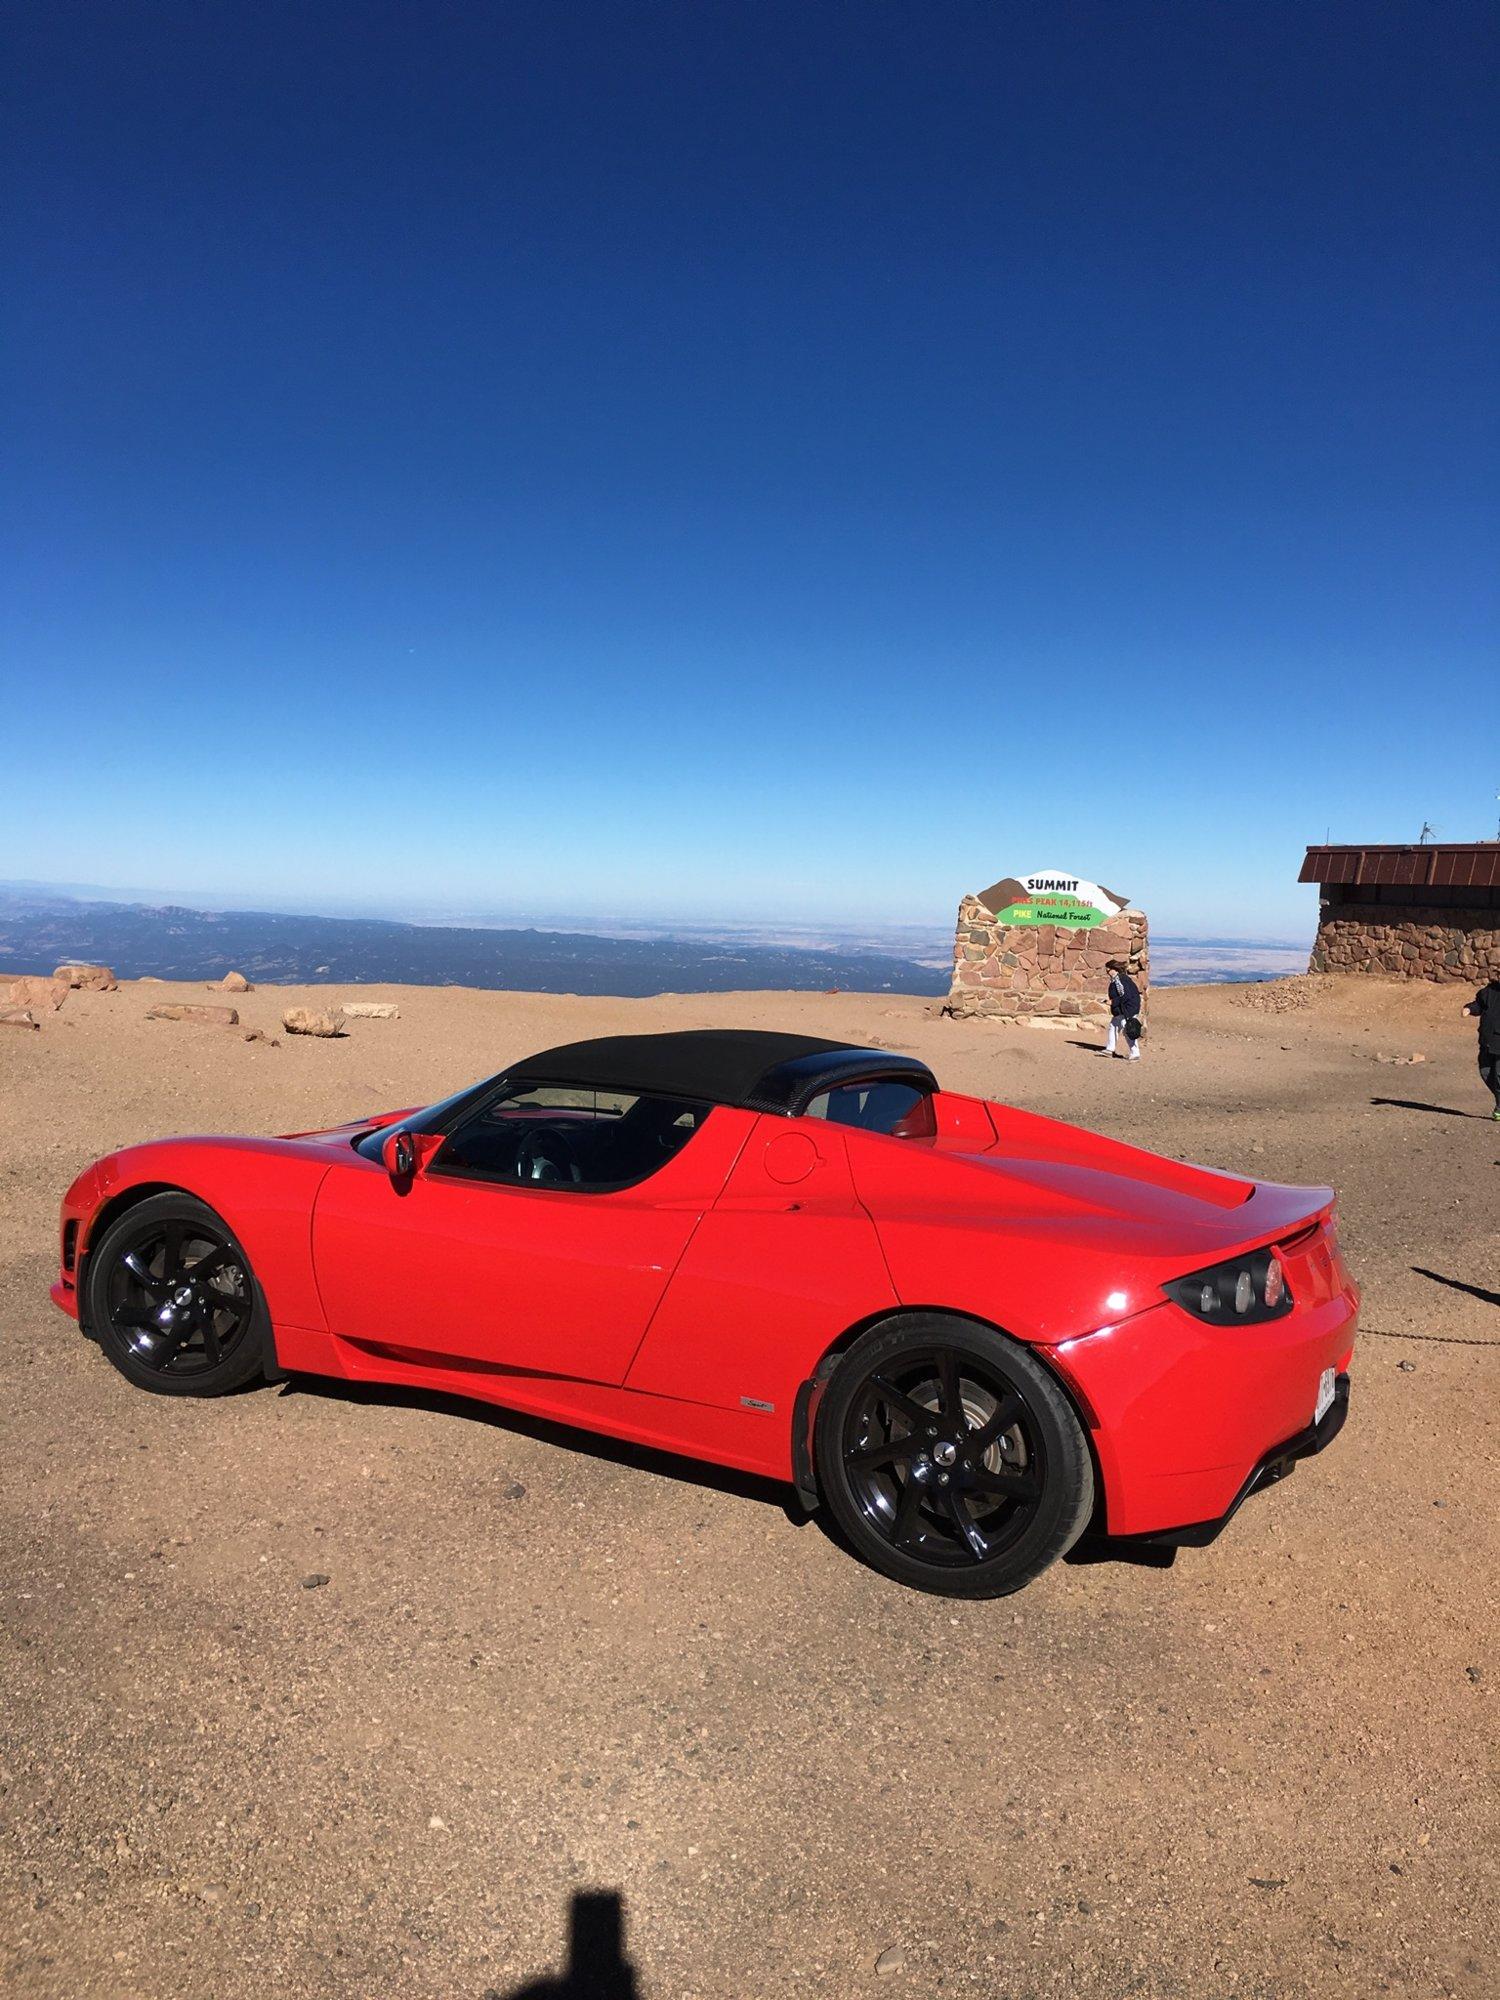 Sumit Tesla pic.JPG